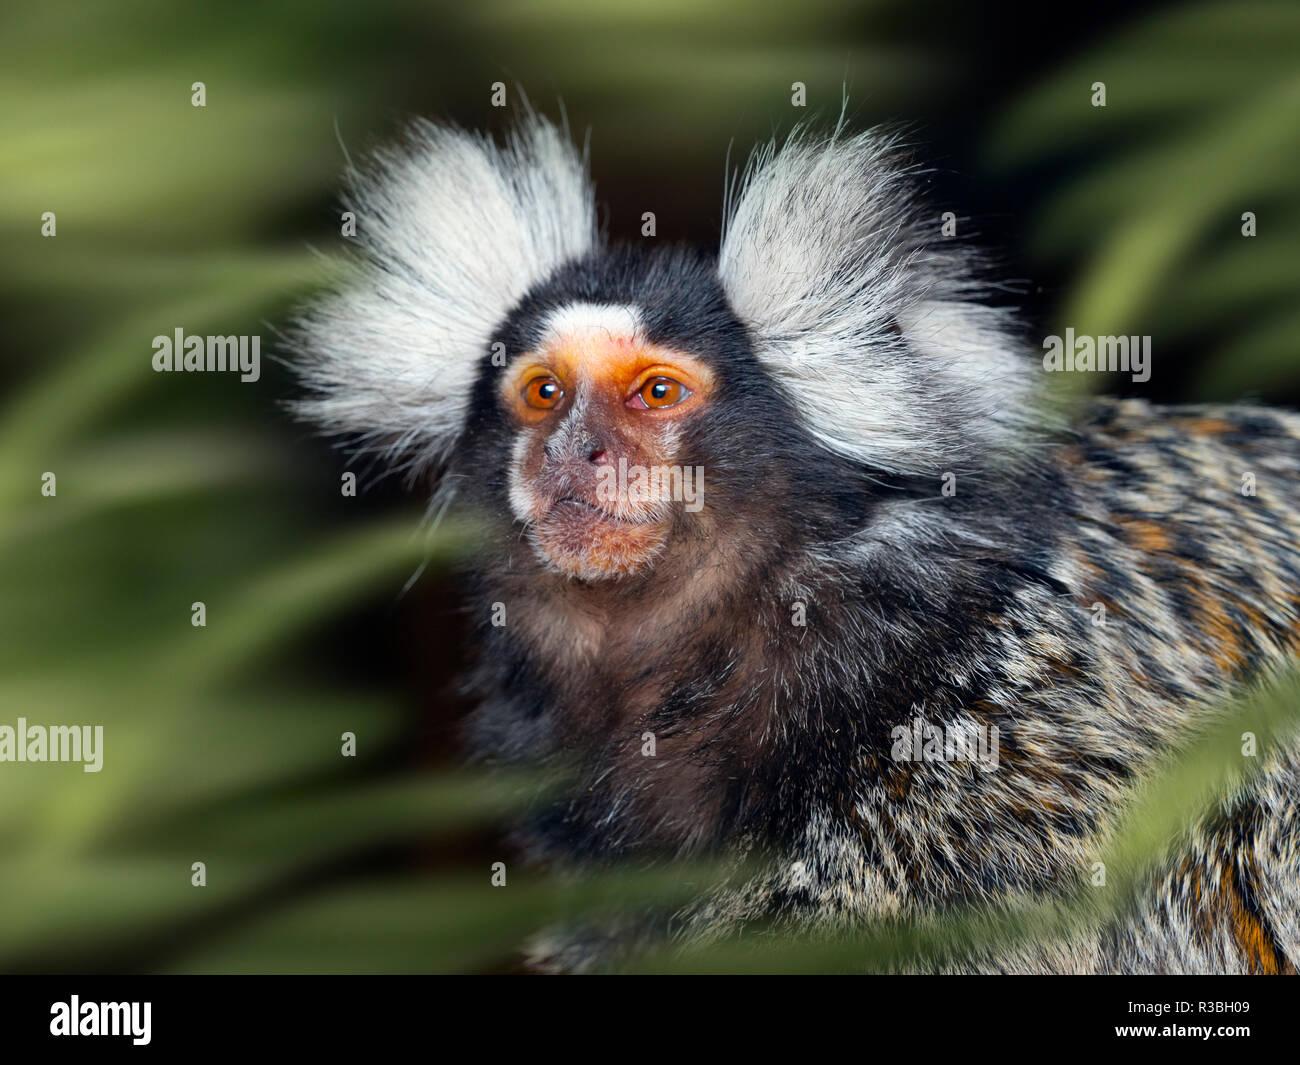 Portrait of a Common marmoset Callithrix jacchus           CAPTIVE - Stock Image